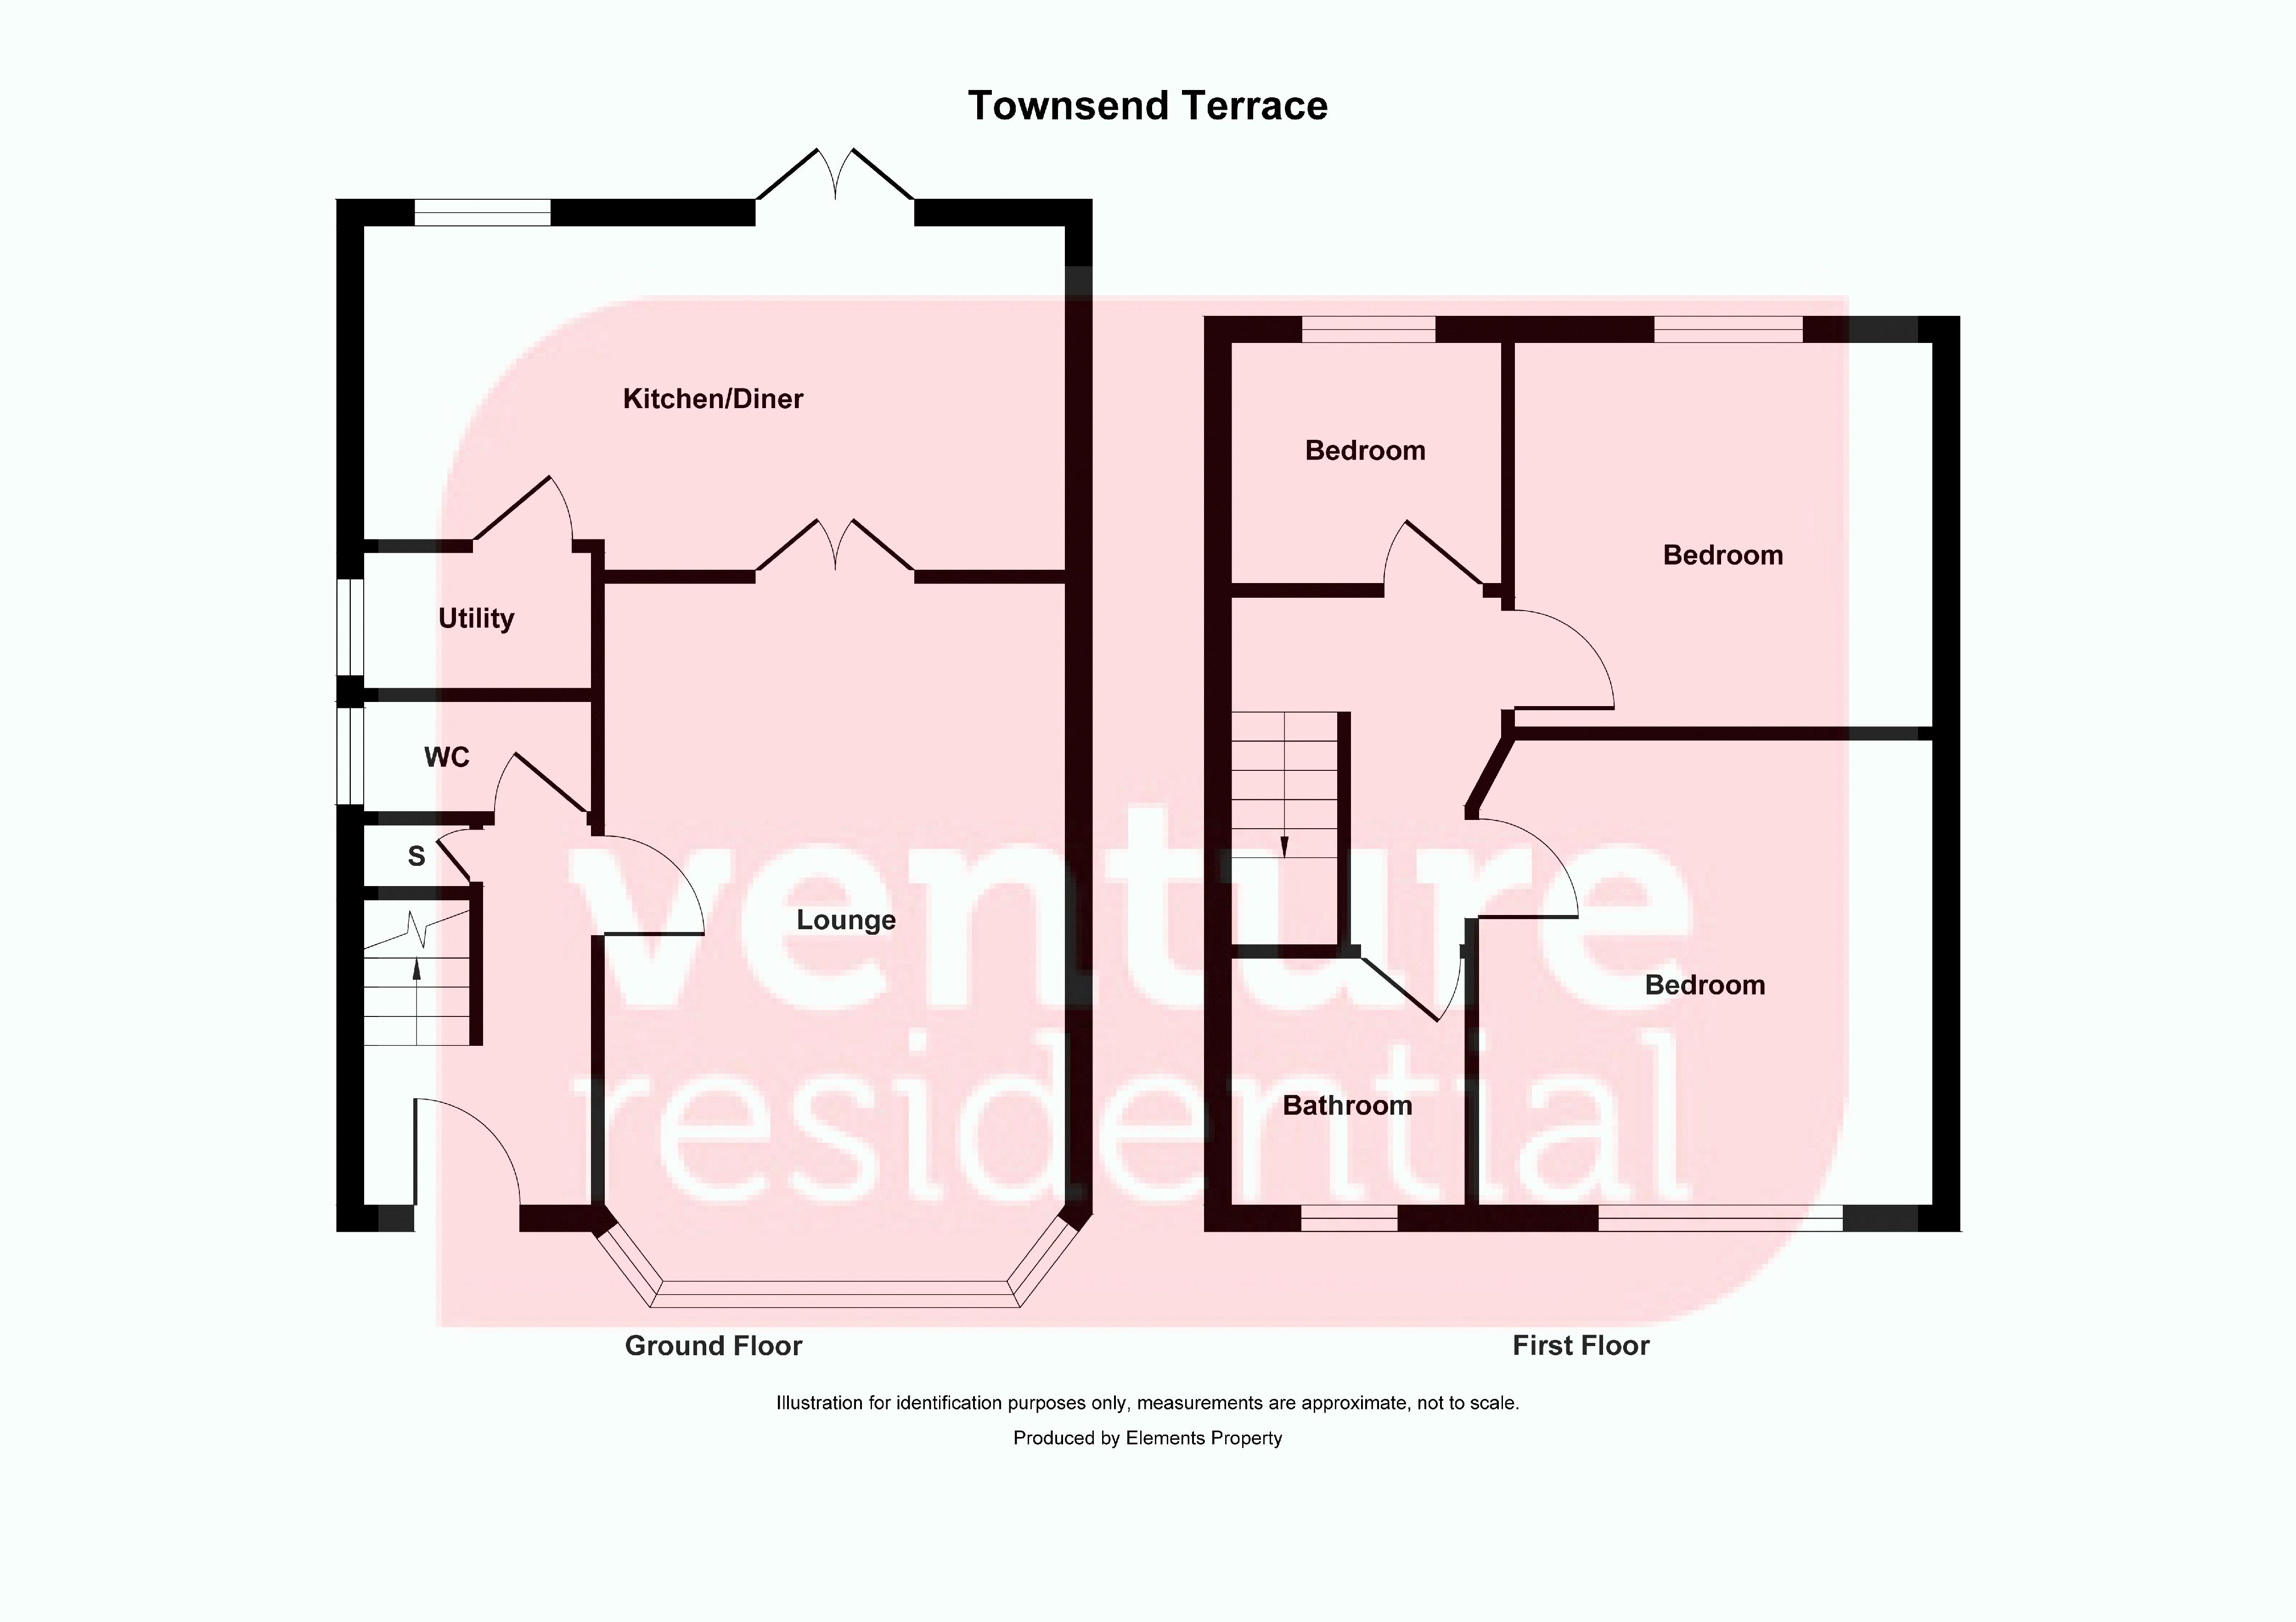 Townsend Terrace